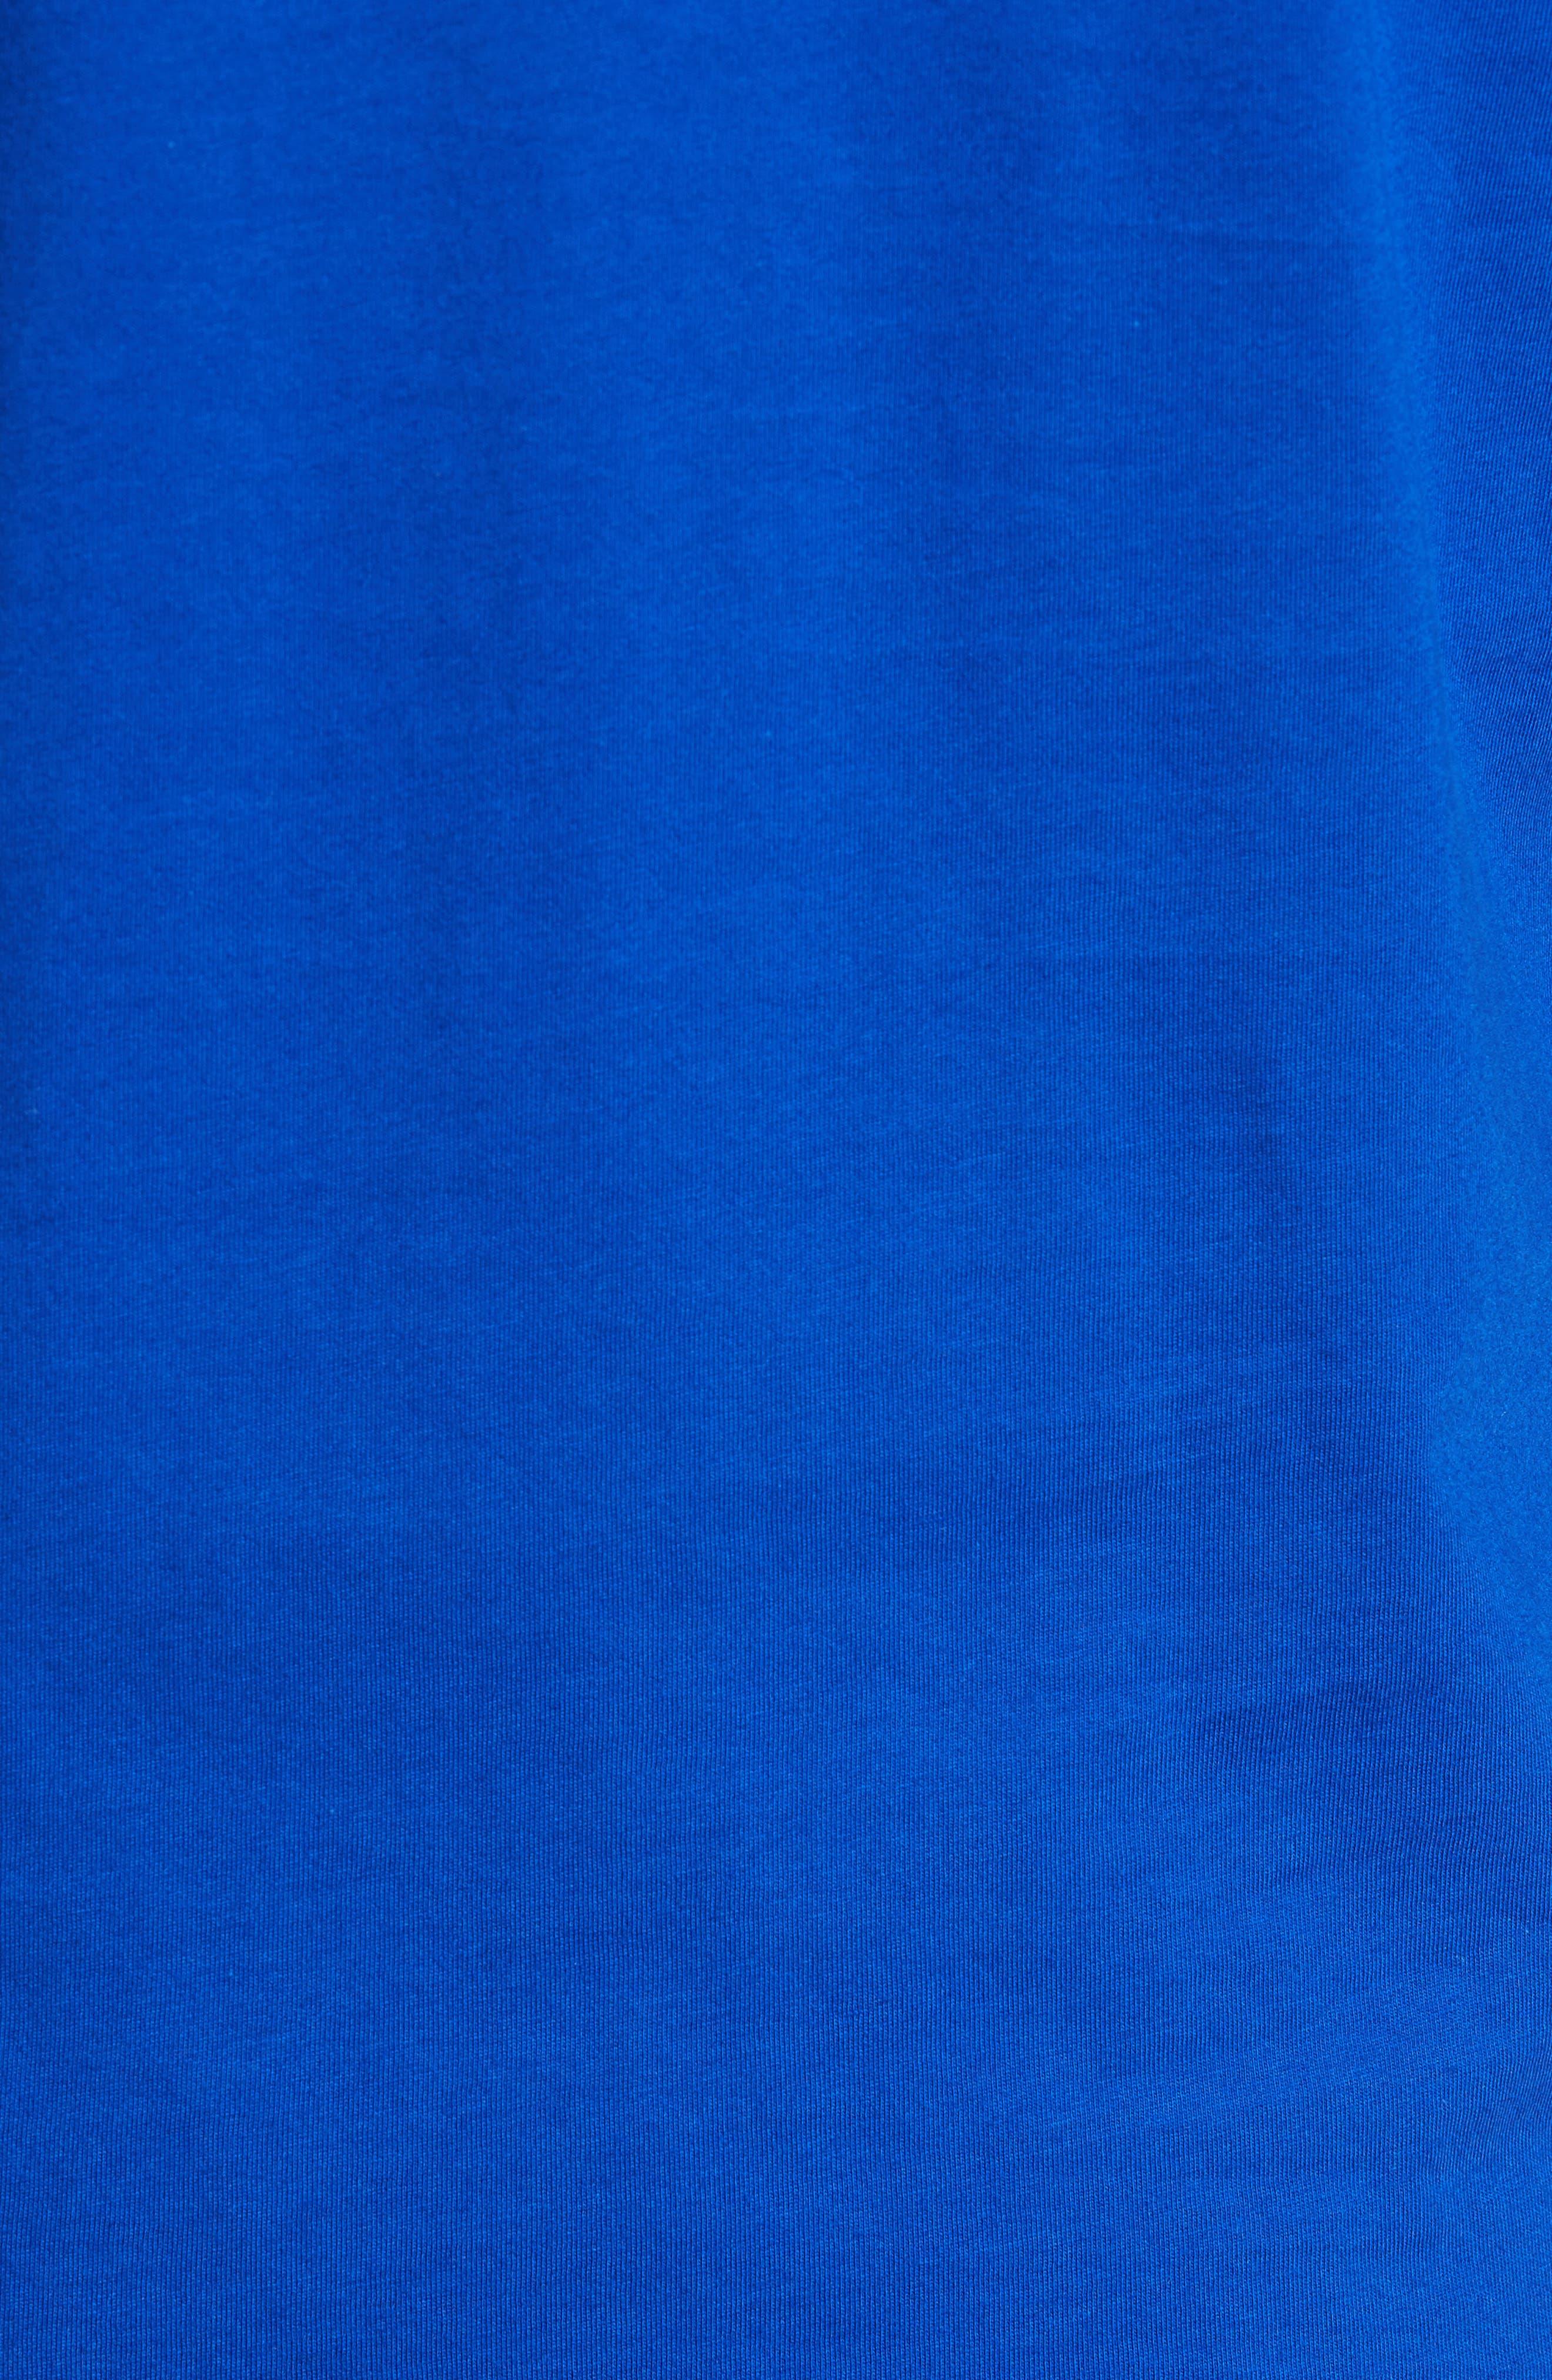 Polo Ralph Lauren Crewneck T-Shirt,                             Alternate thumbnail 5, color,                             Sapphire Star/ Crescent Cream